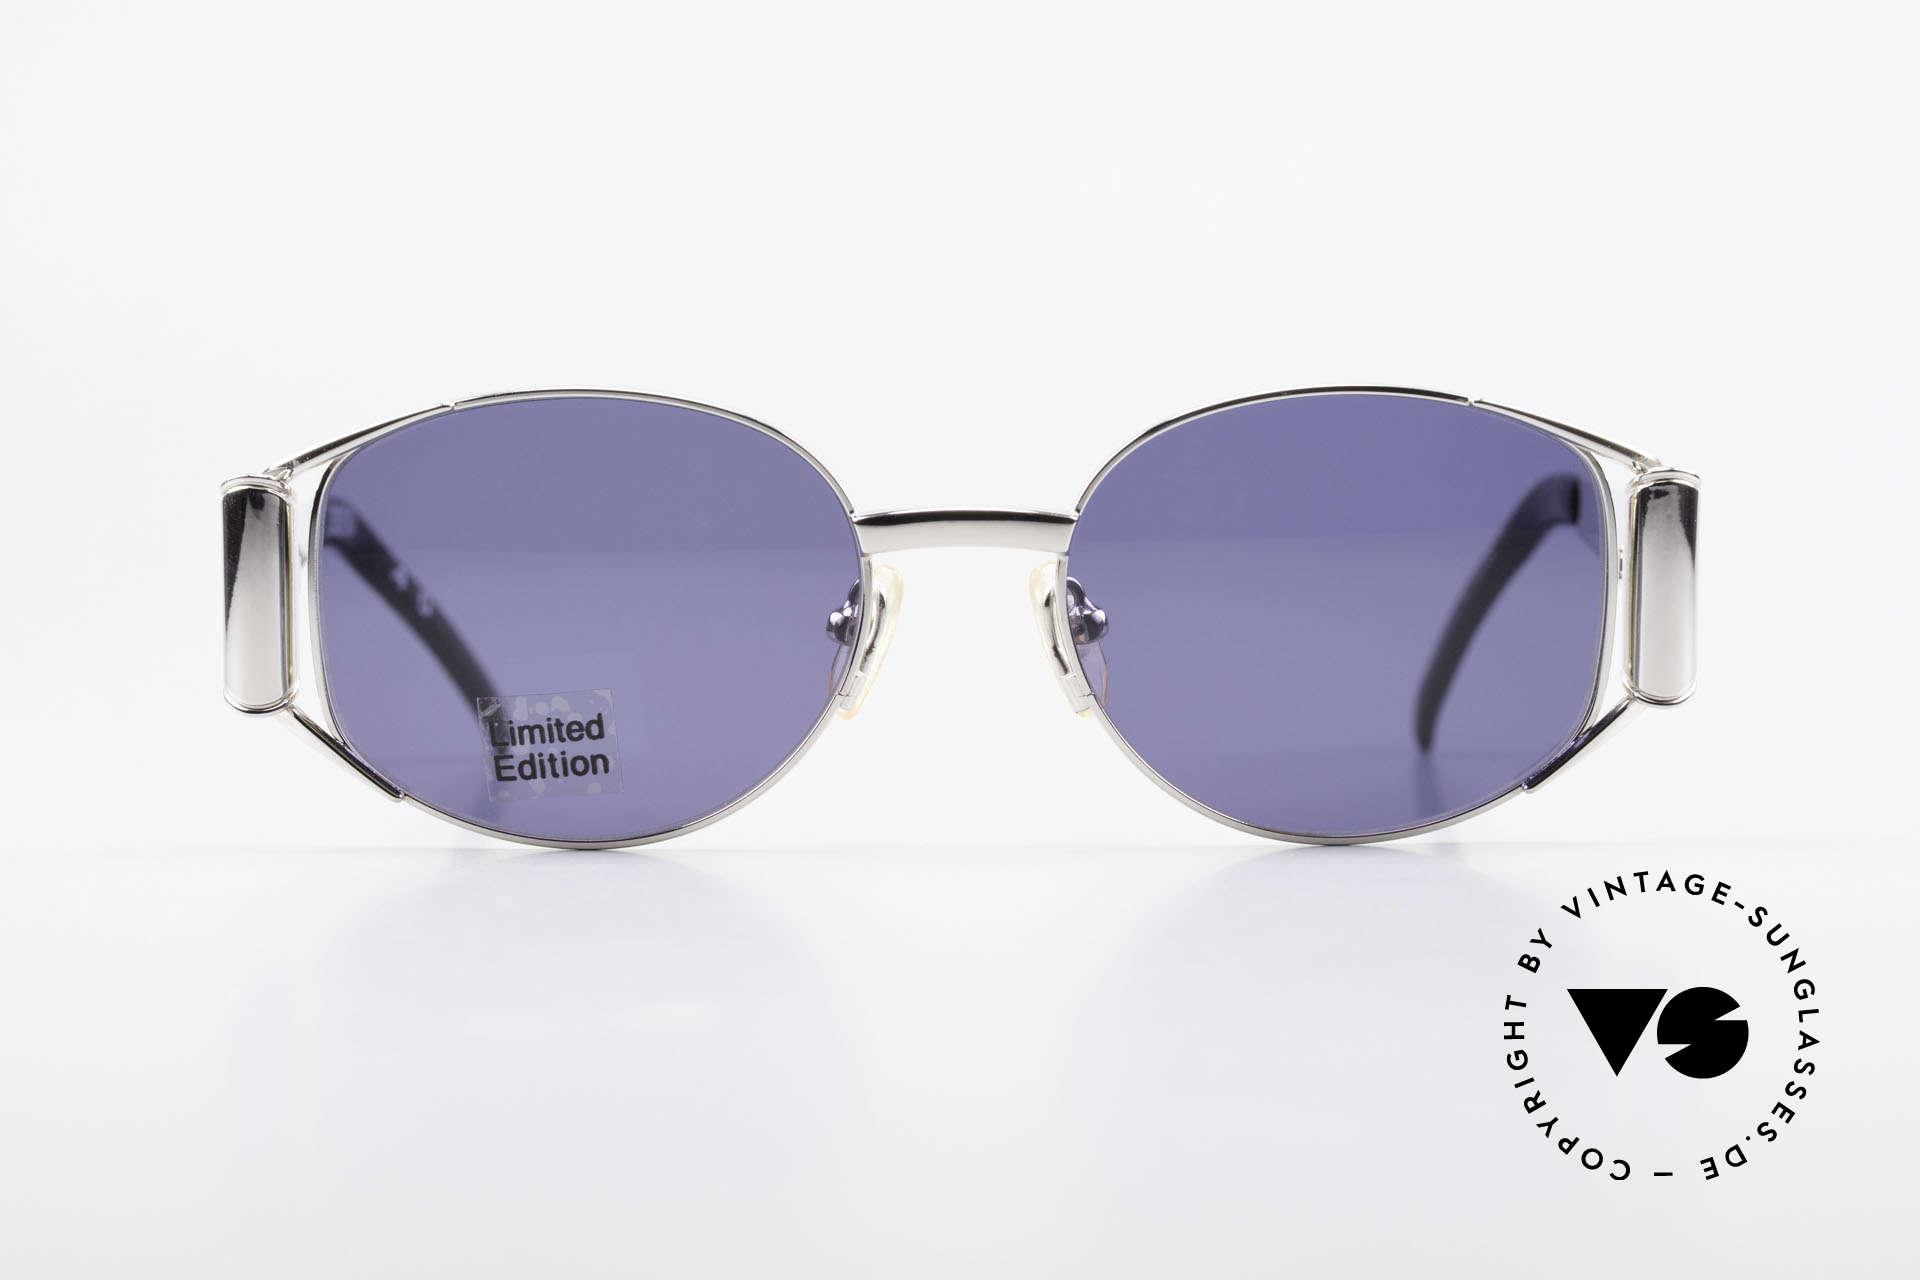 Yohji Yamamoto 52-5107 Limited Edition Sunglasses, extraordinary but subtle design elements; avant-garde!!, Made for Men and Women